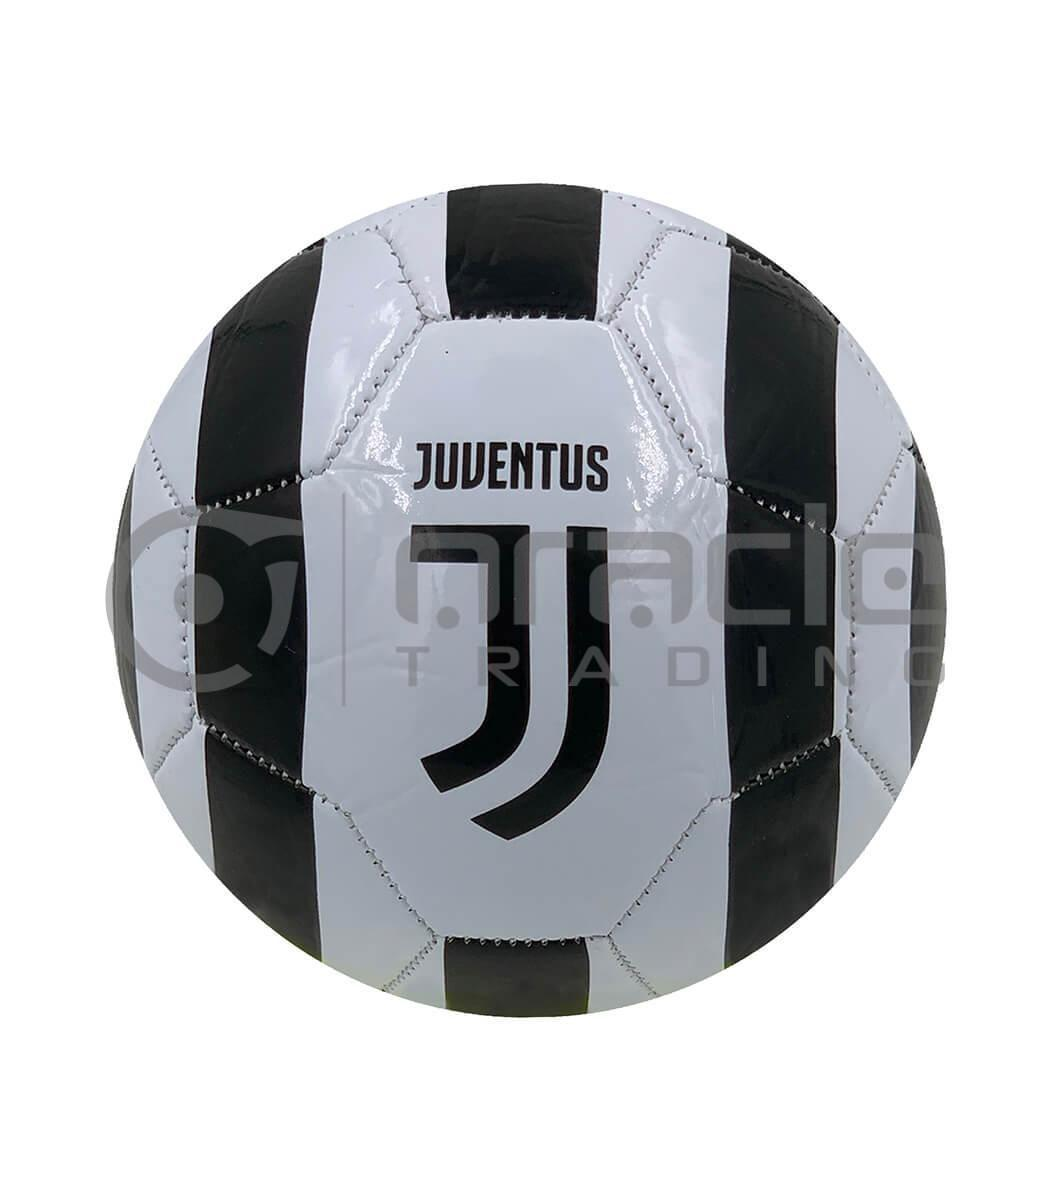 Juventus Mini Soccer Ball